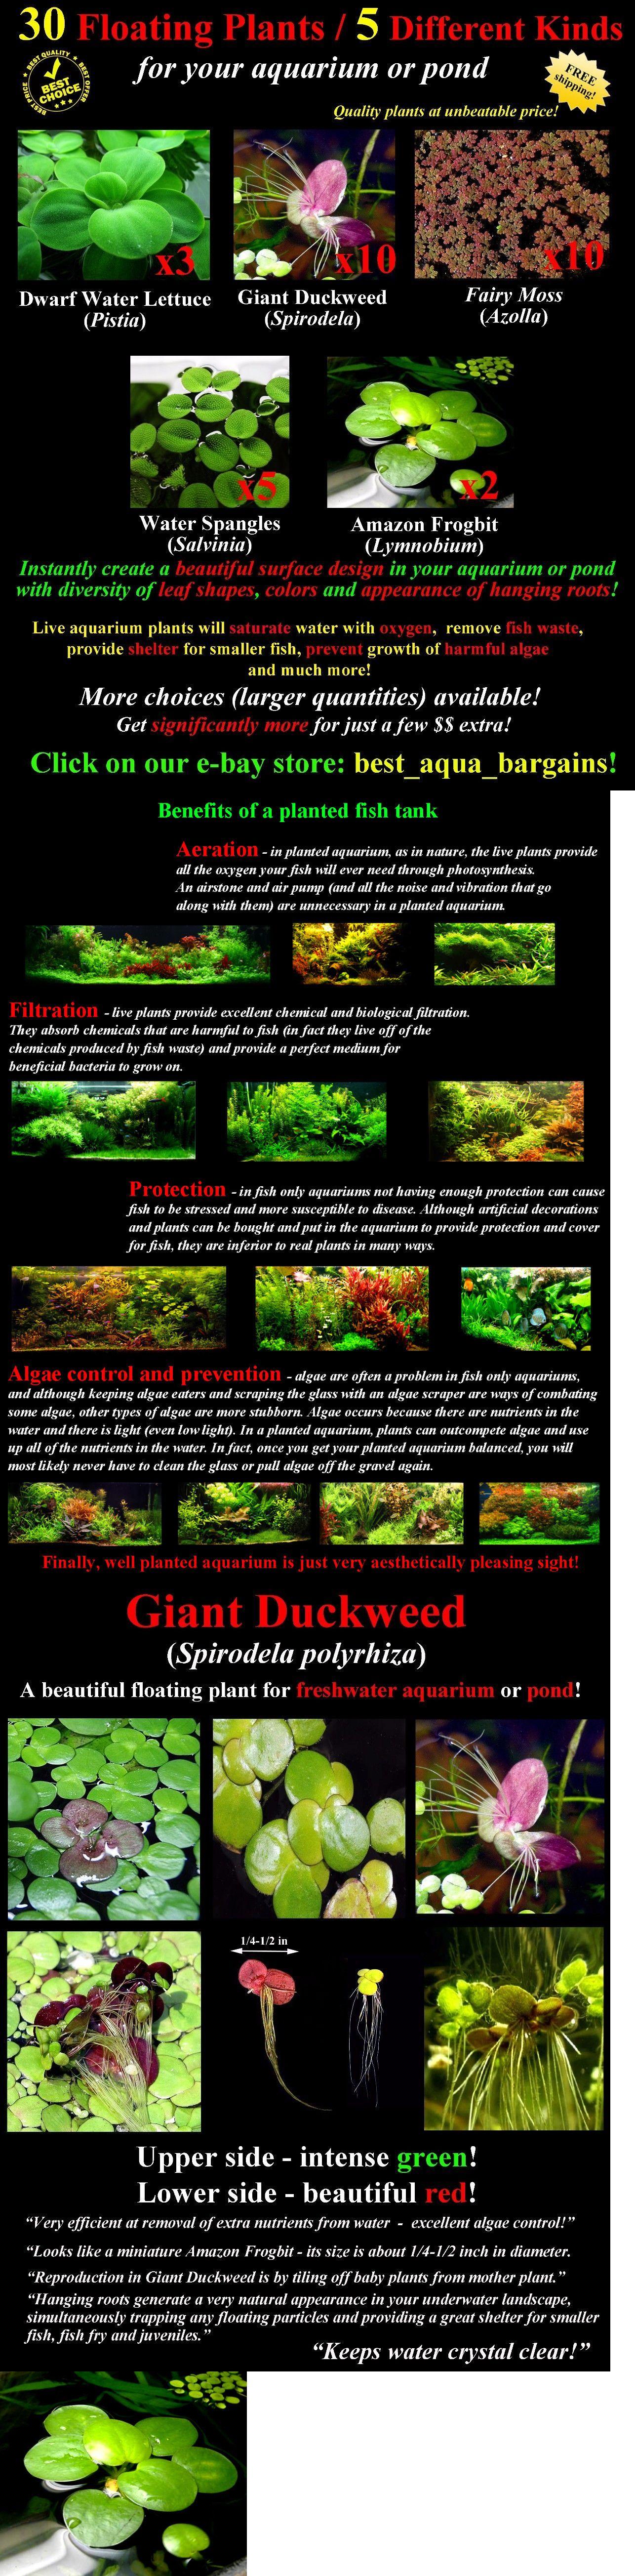 30 Floating Live Plants 5 Types for Aquarium or Pond Moss Fern Anubias Betta